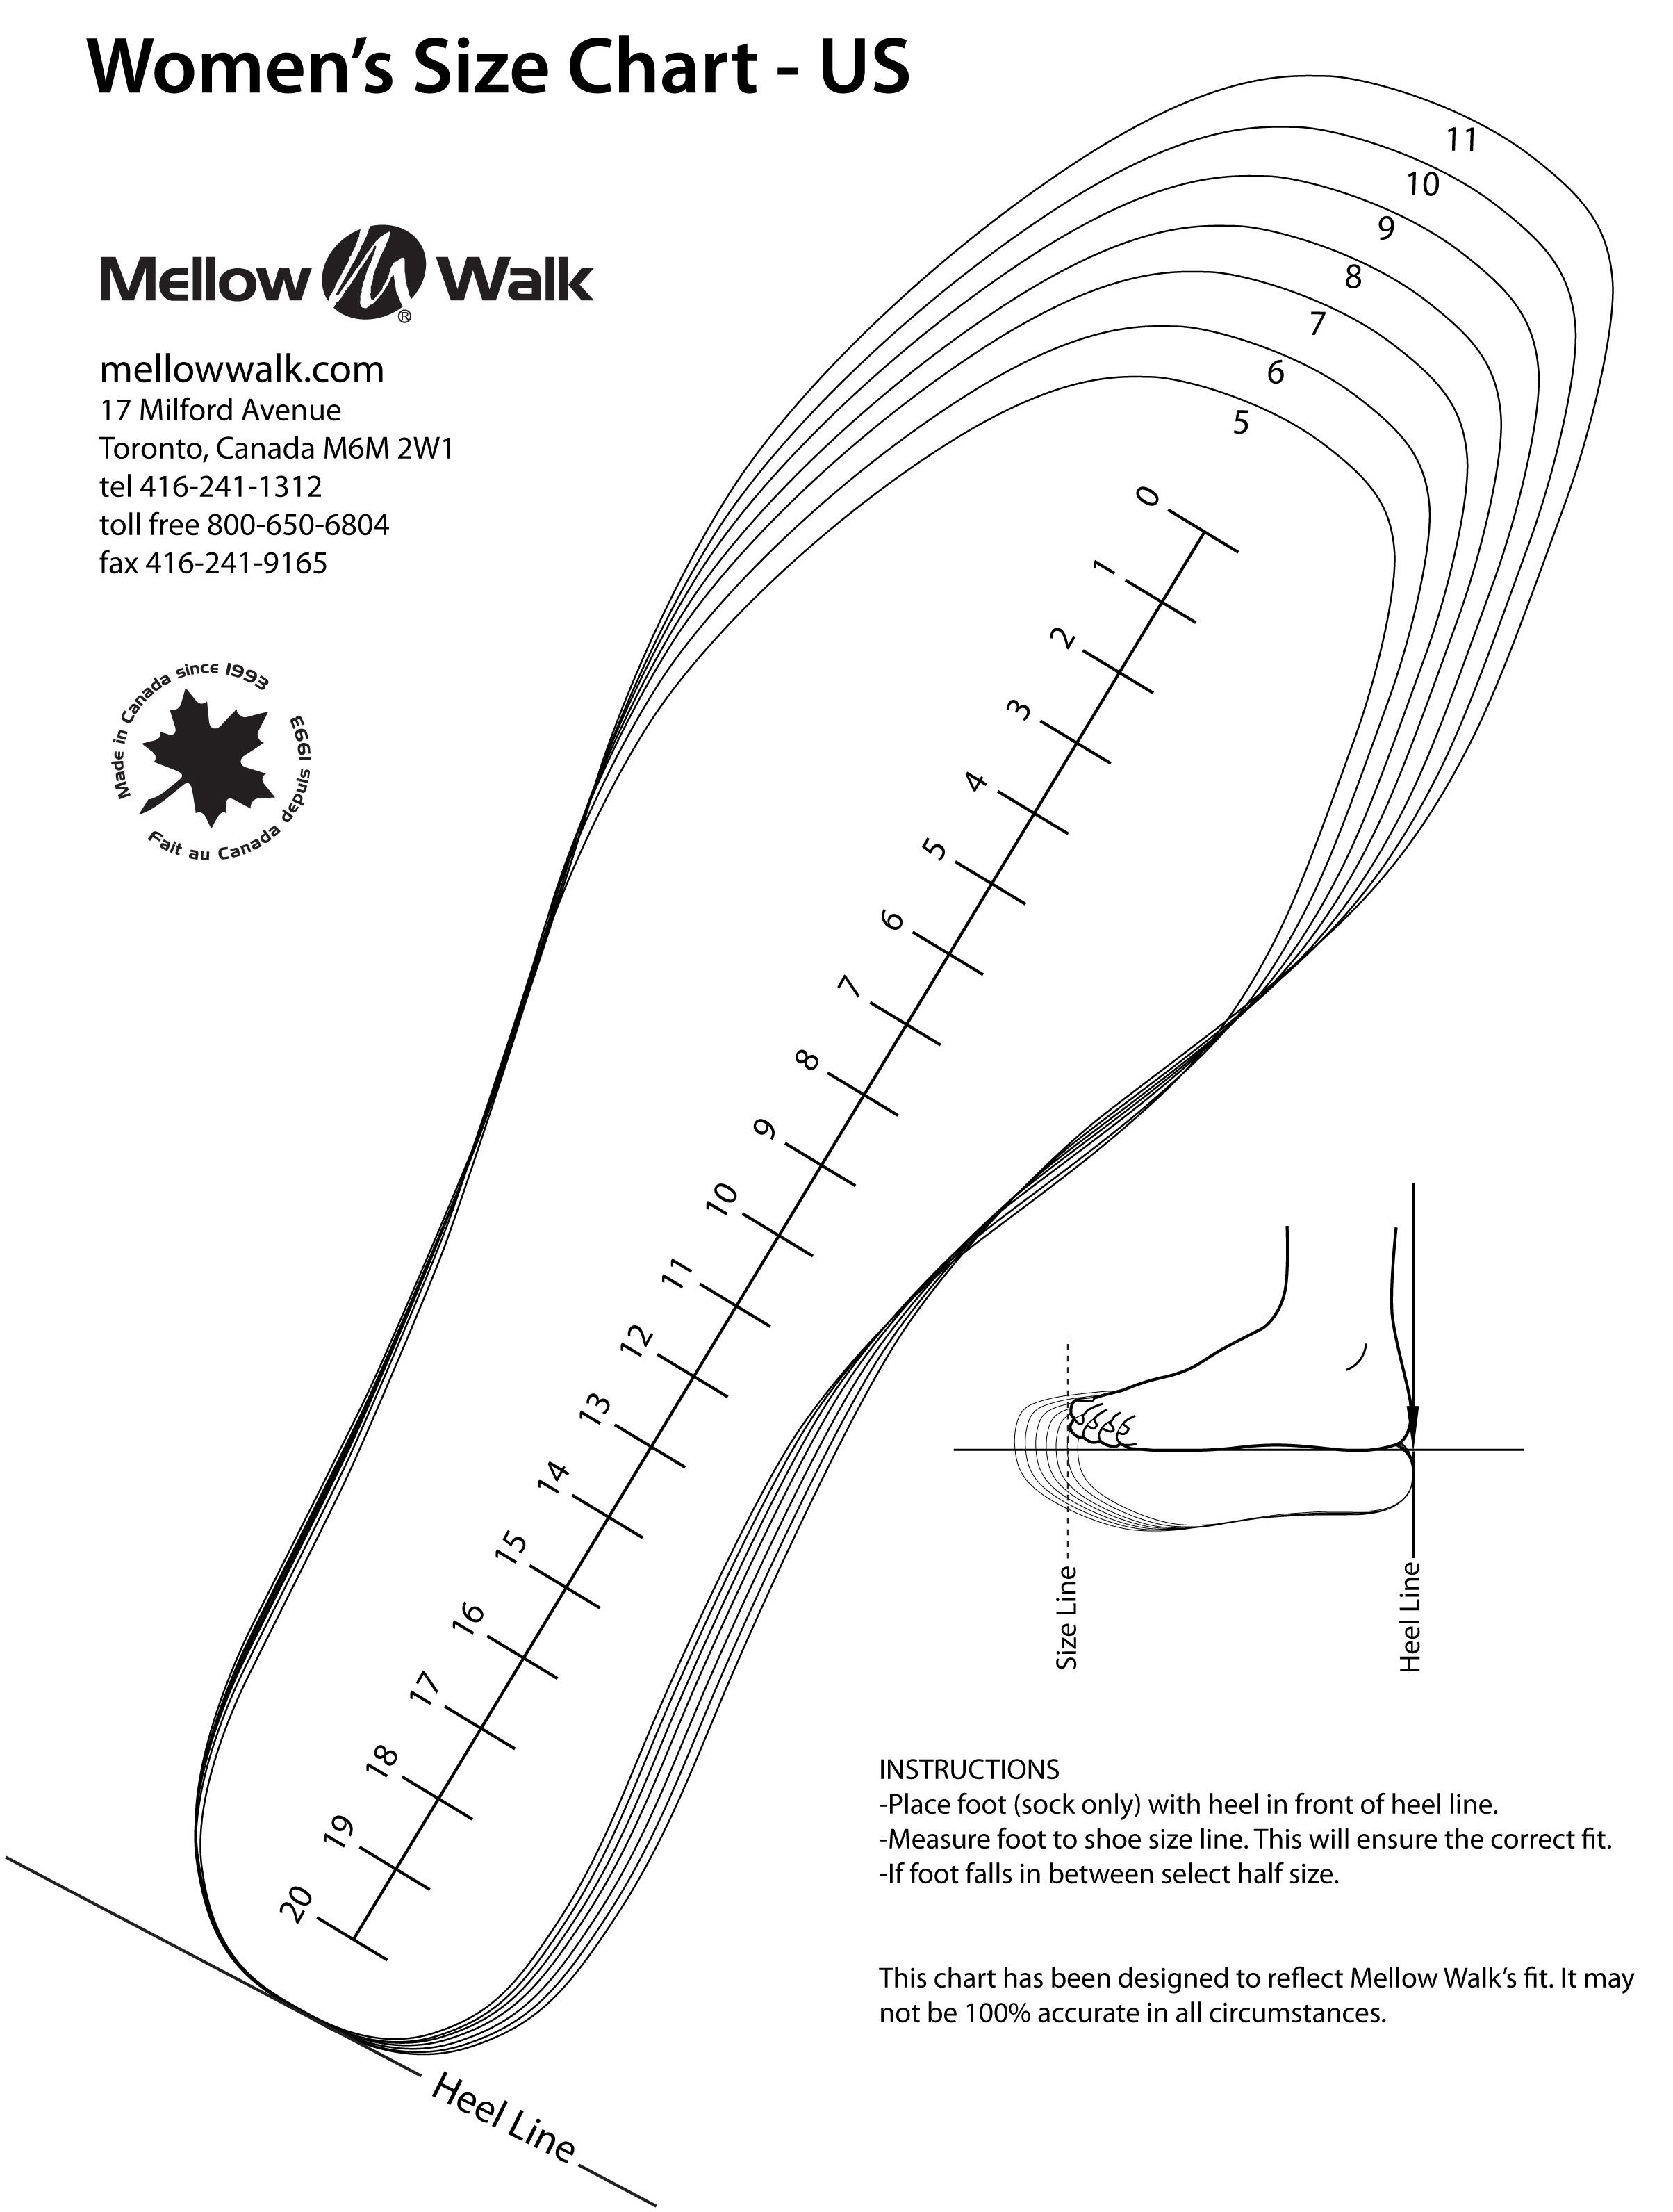 image regarding Brannock Device Printable identified as Foot Measuring Template. faq upon measurement and use of